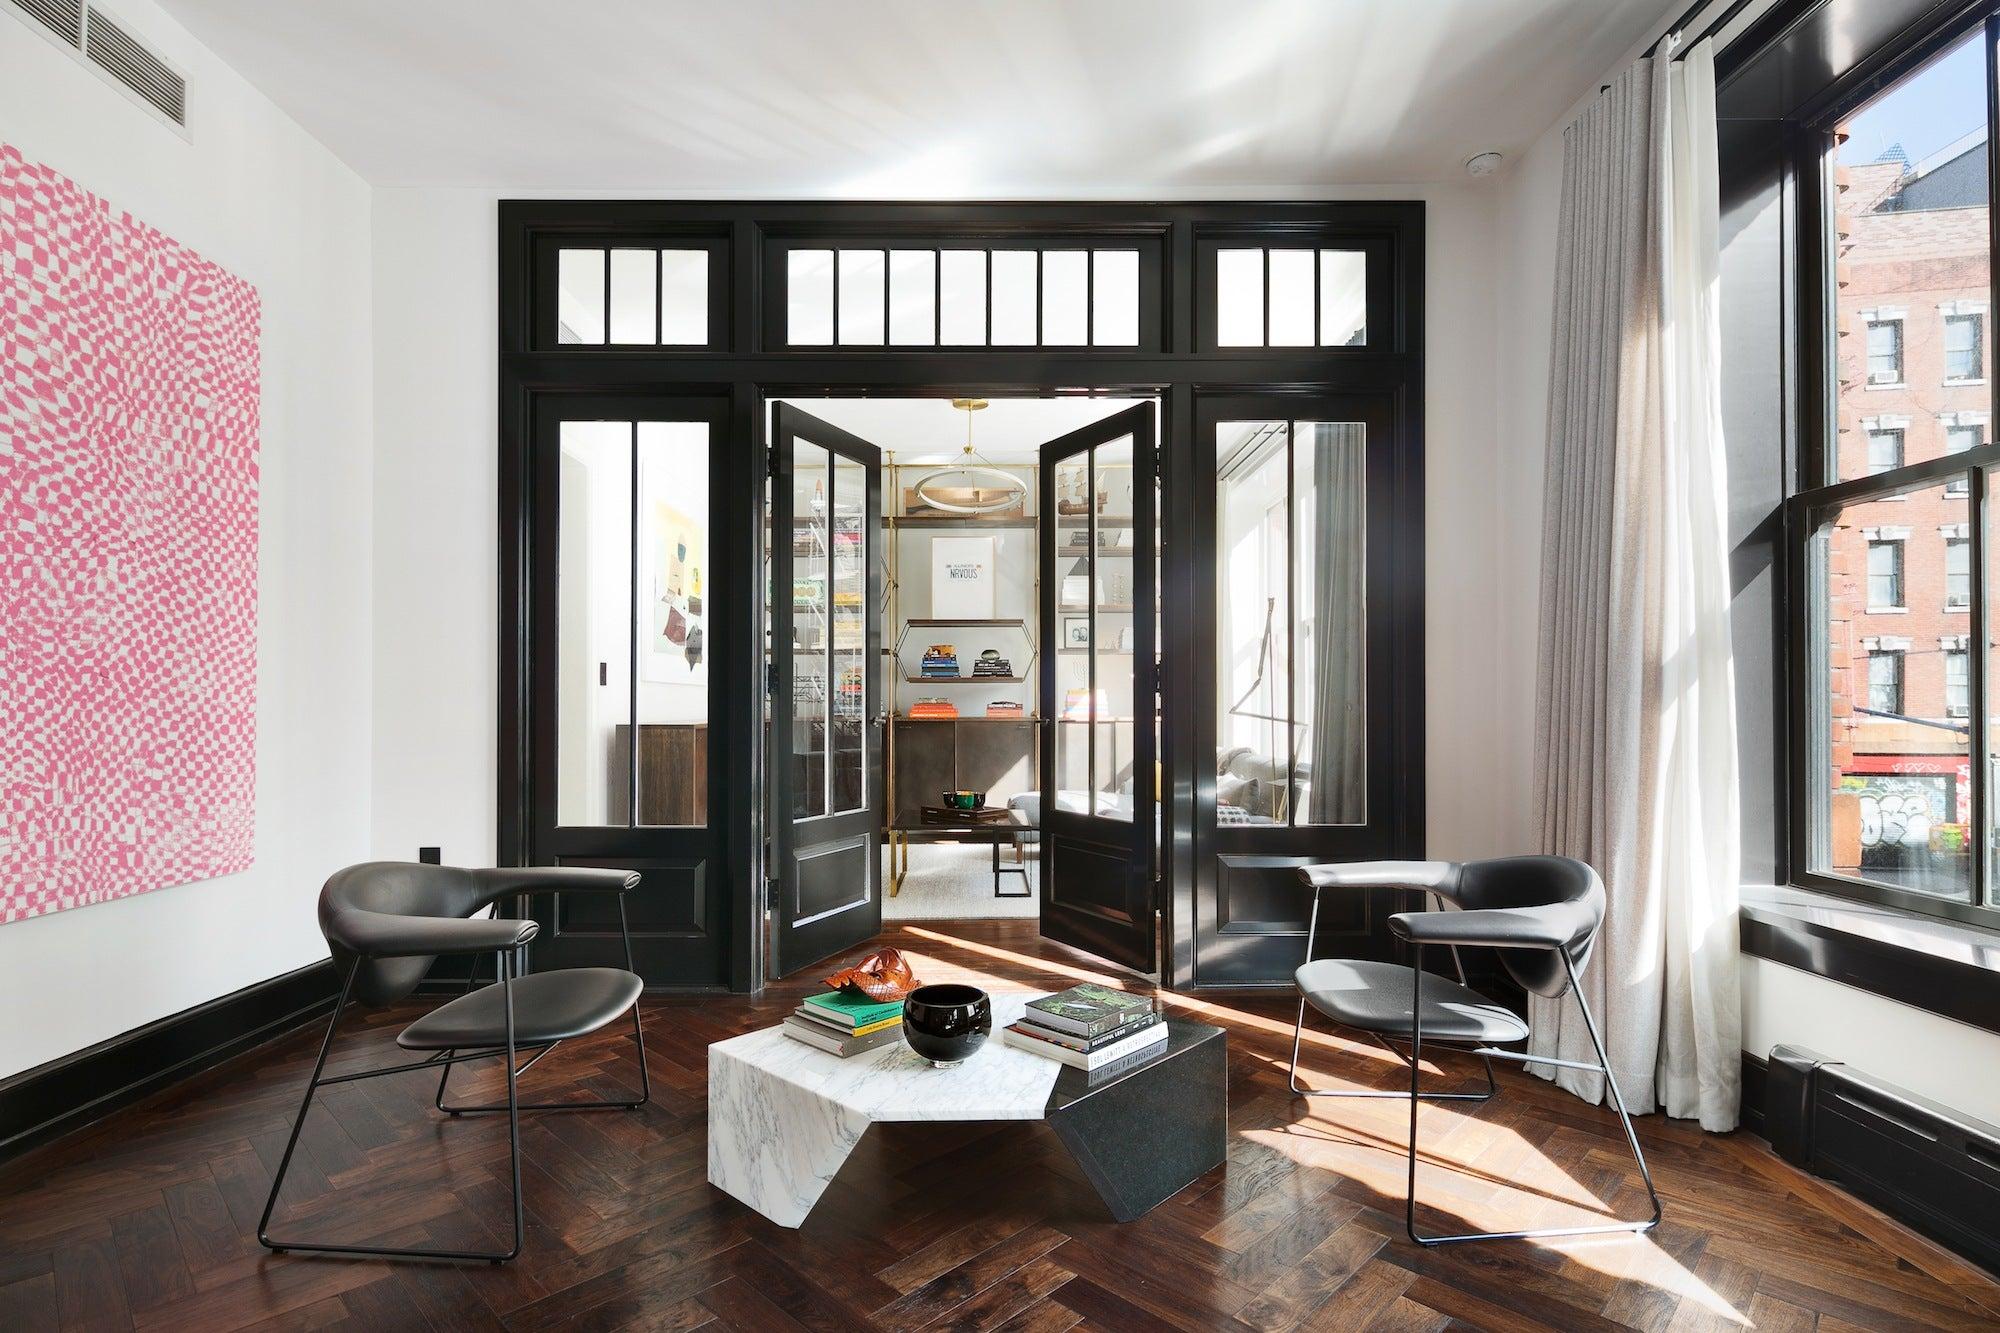 Karlie Kloss and Josh Kushner's Nolita Apartment is Now on the Market